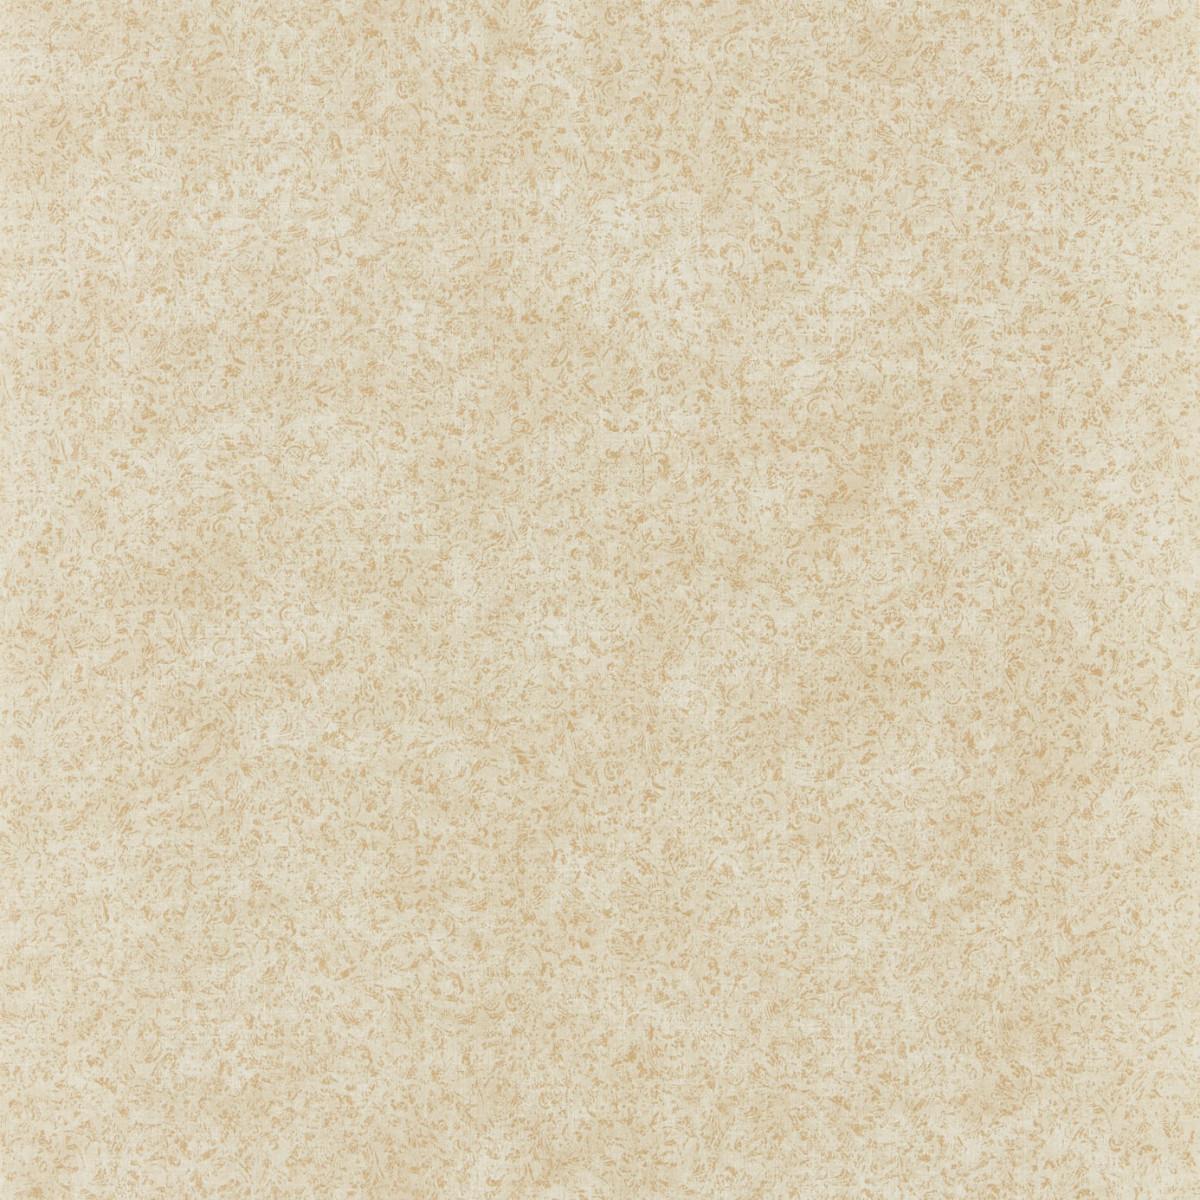 Обои флизелиновые Oxford Street Papers Fine English Wallpapers Vol. I бежевые 0.53 м ARTP 03